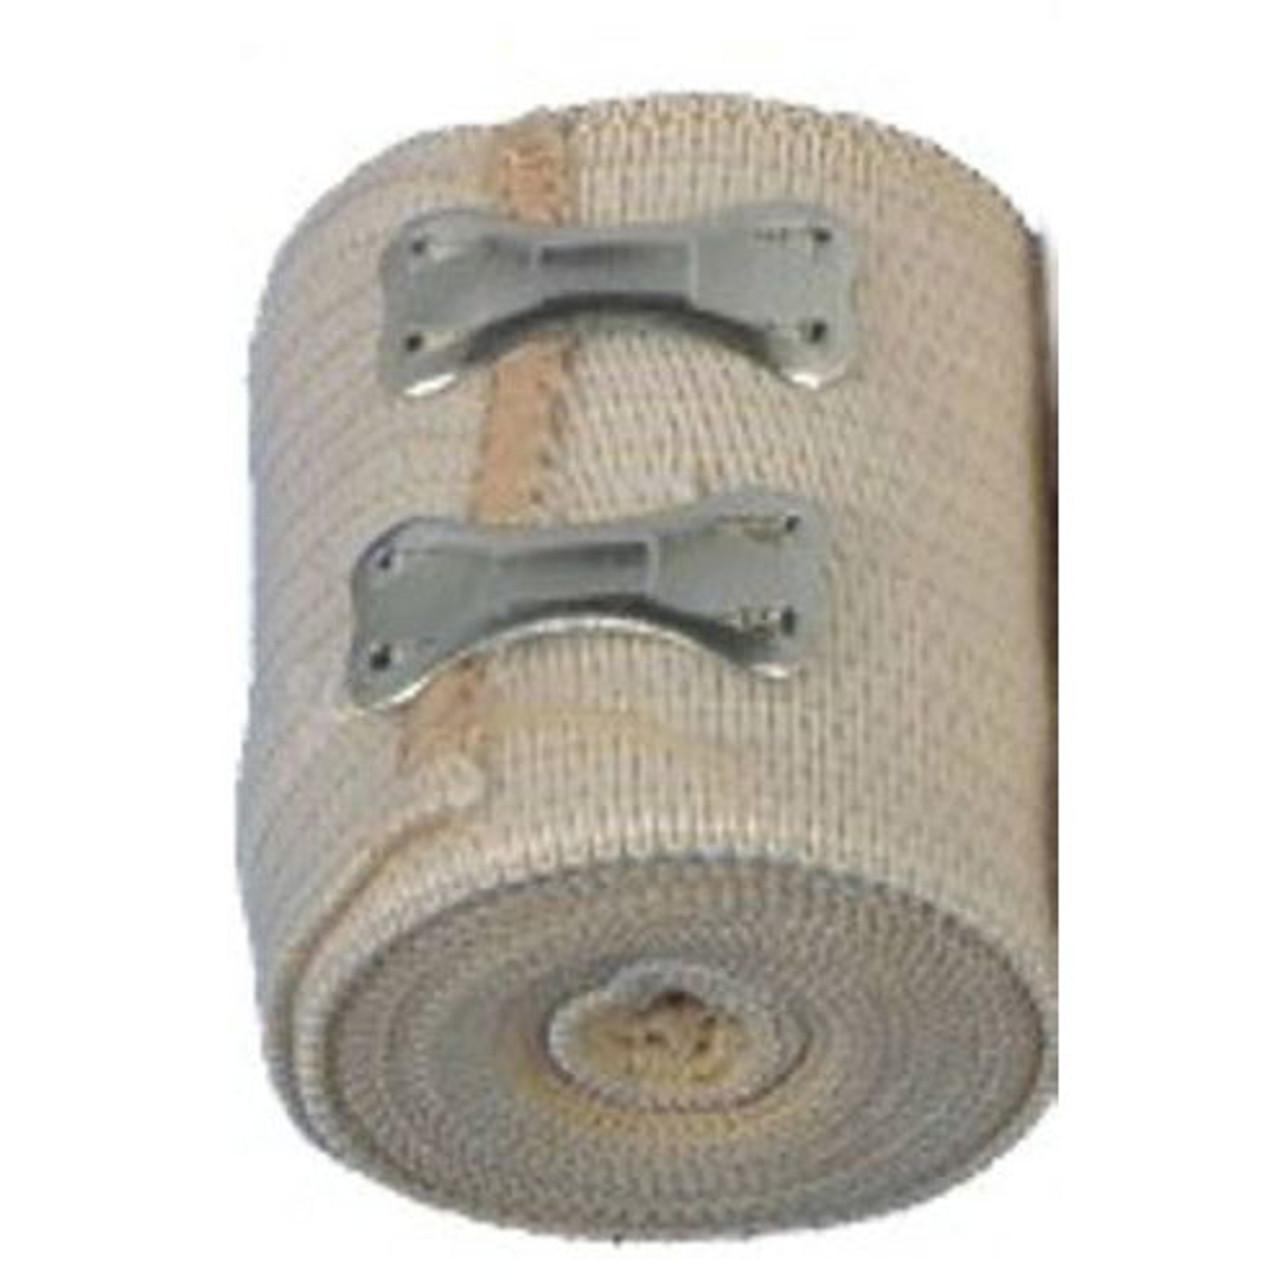 Tensor Elastic Bandage Wrap 4-Inch Beige